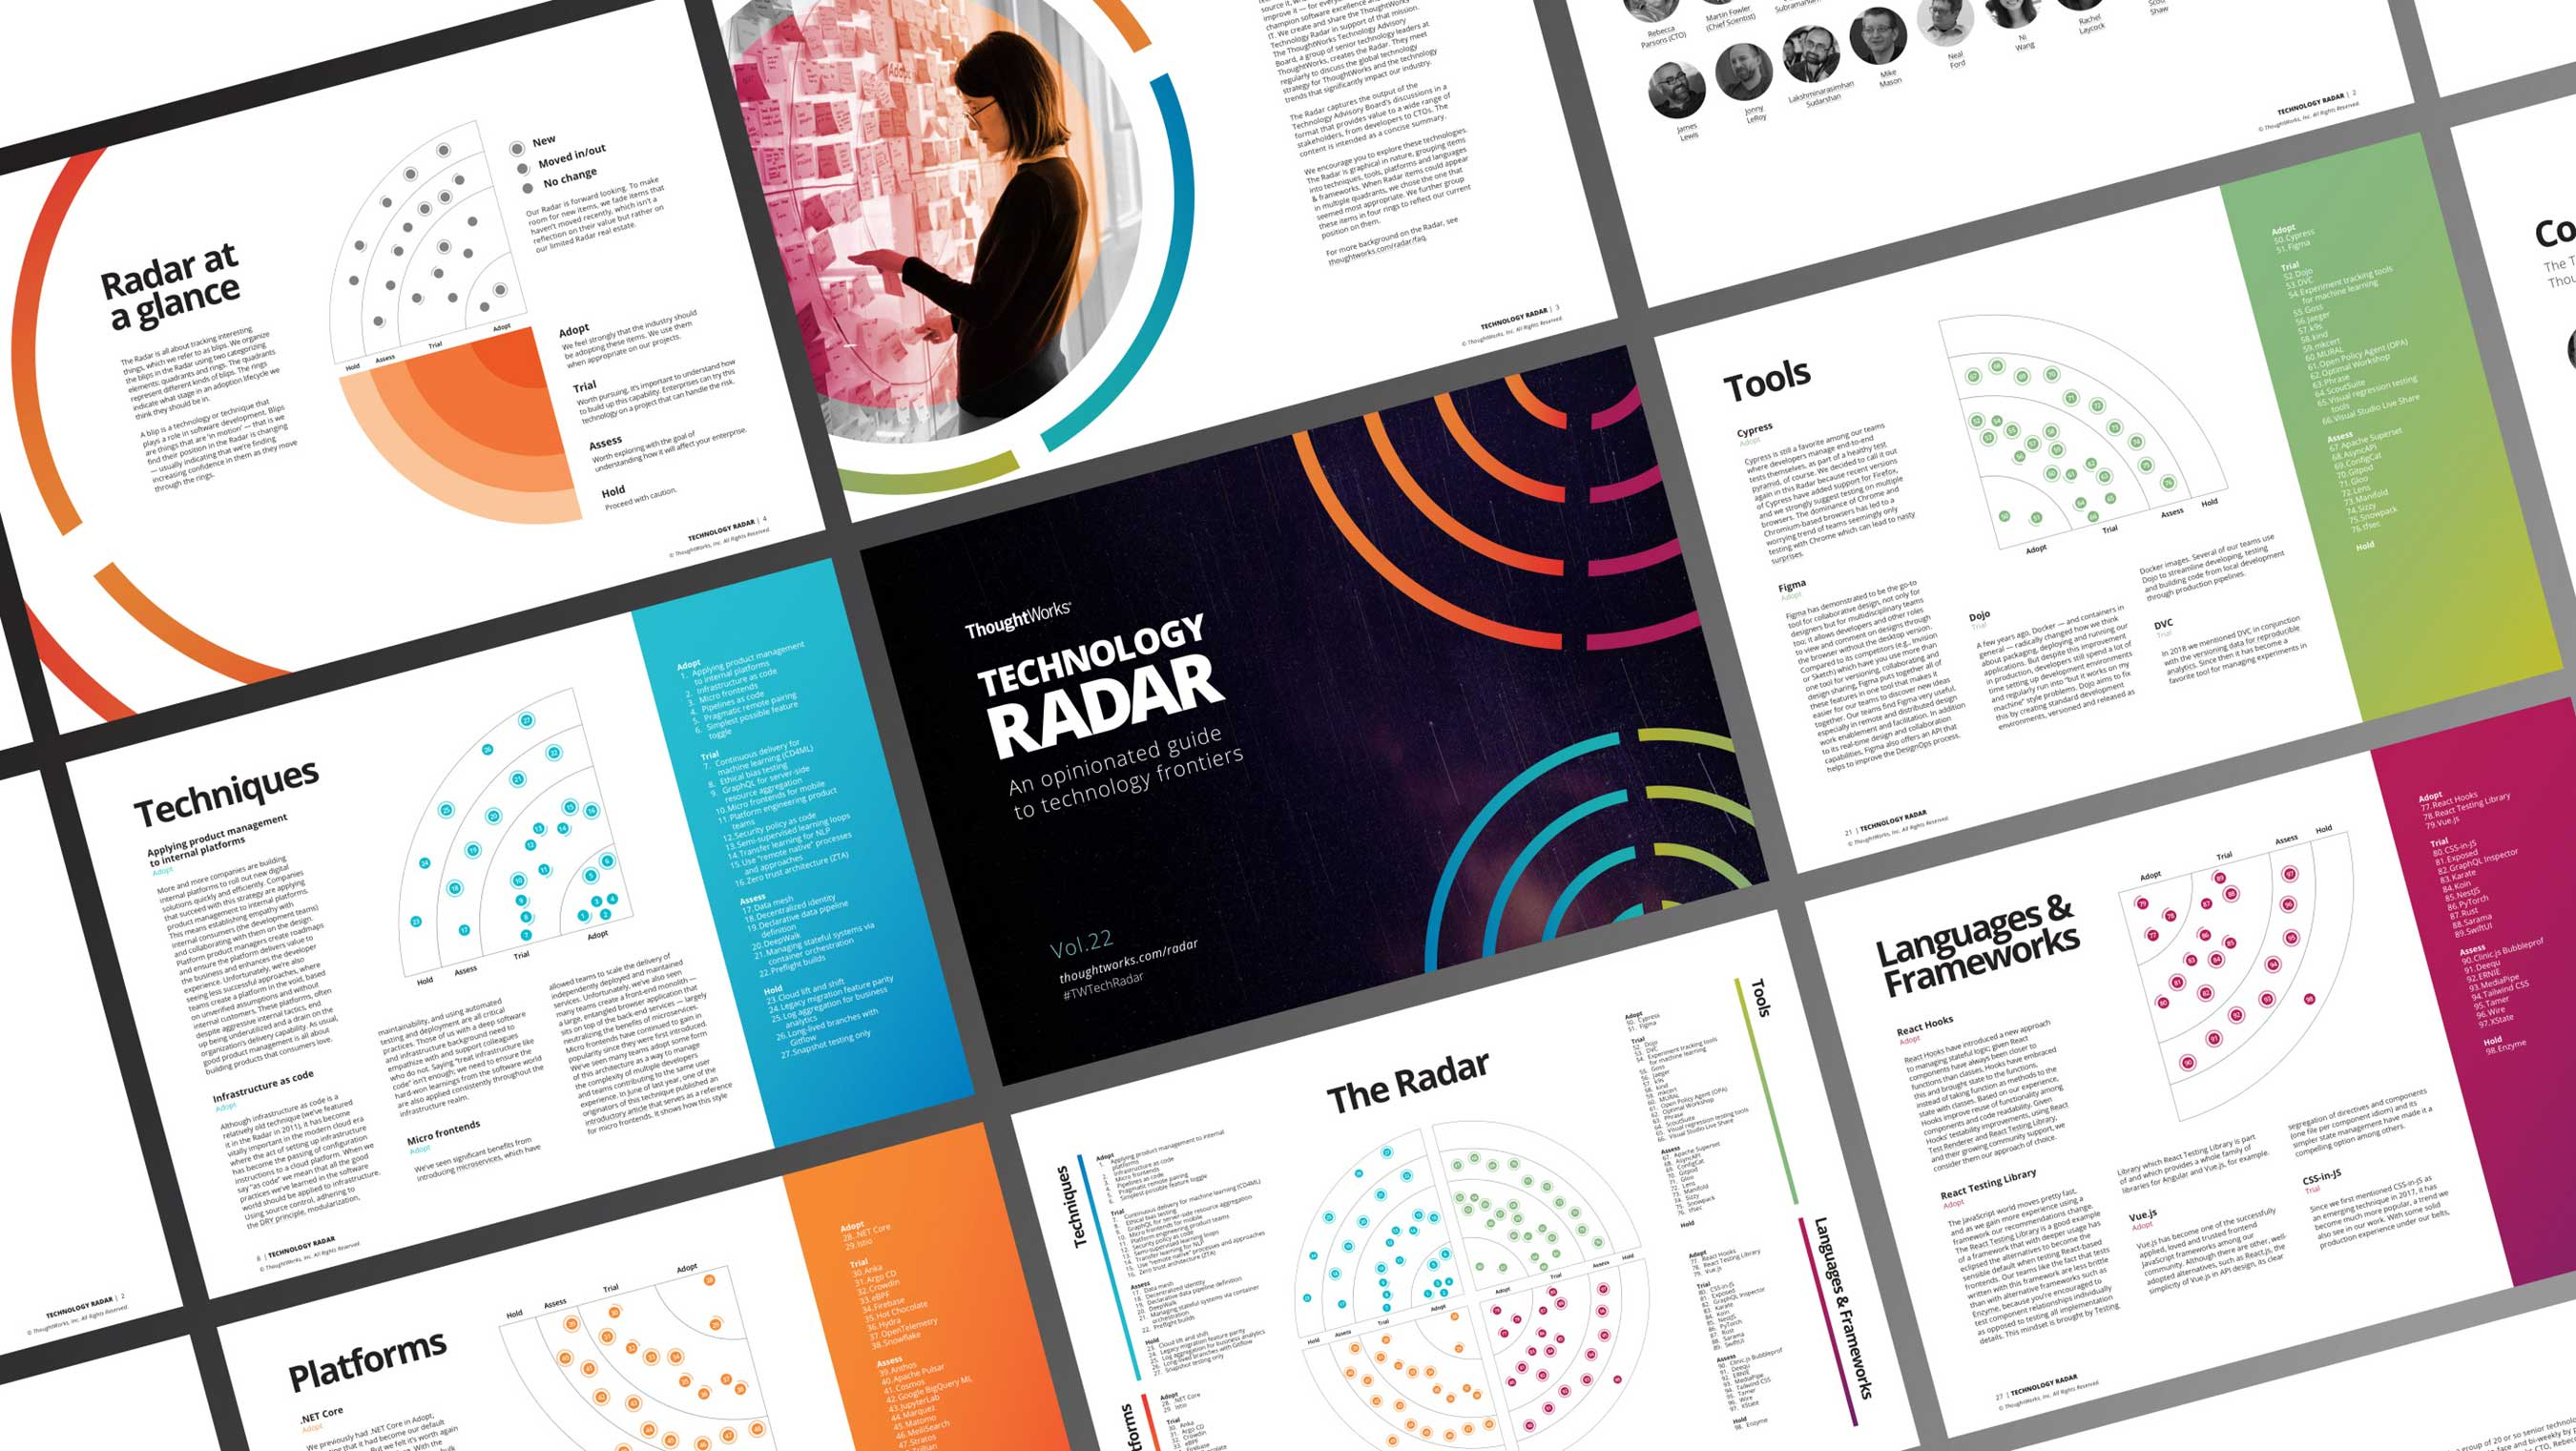 ThoughtWorks Tech Radar Volume 22